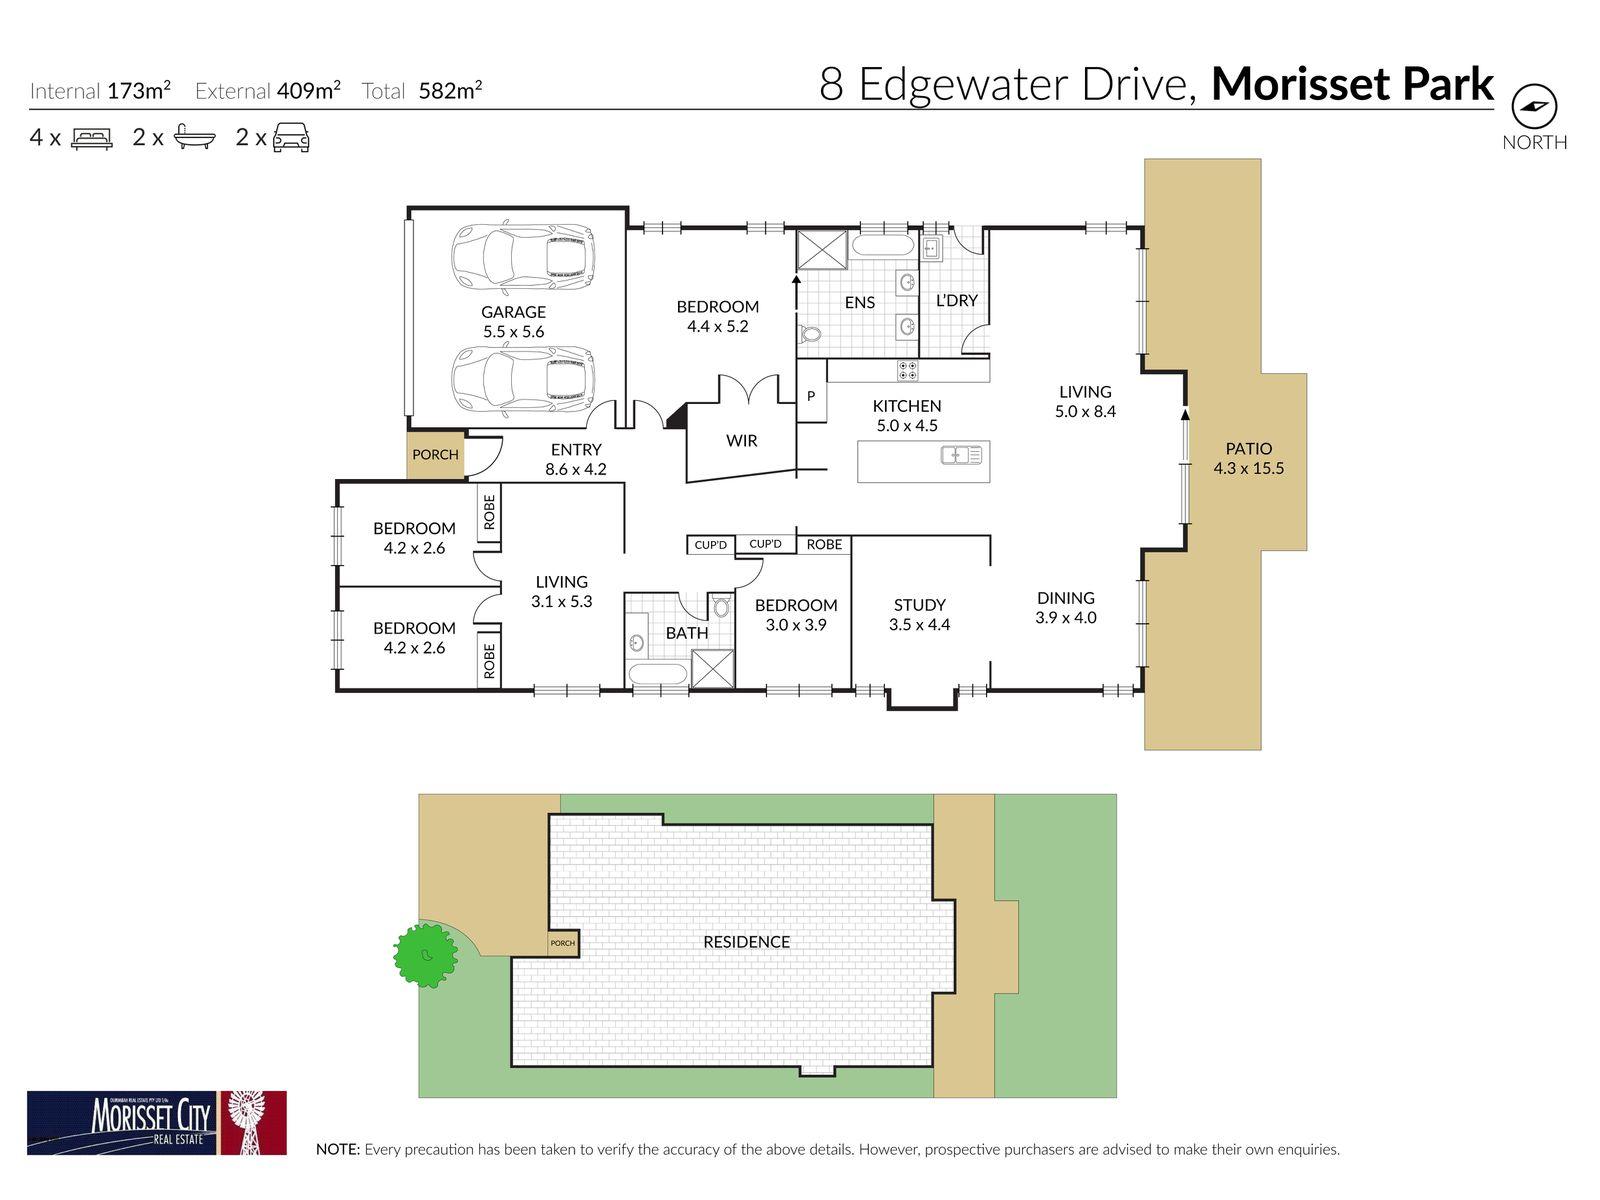 8 Edgewater Drive, Morisset Park